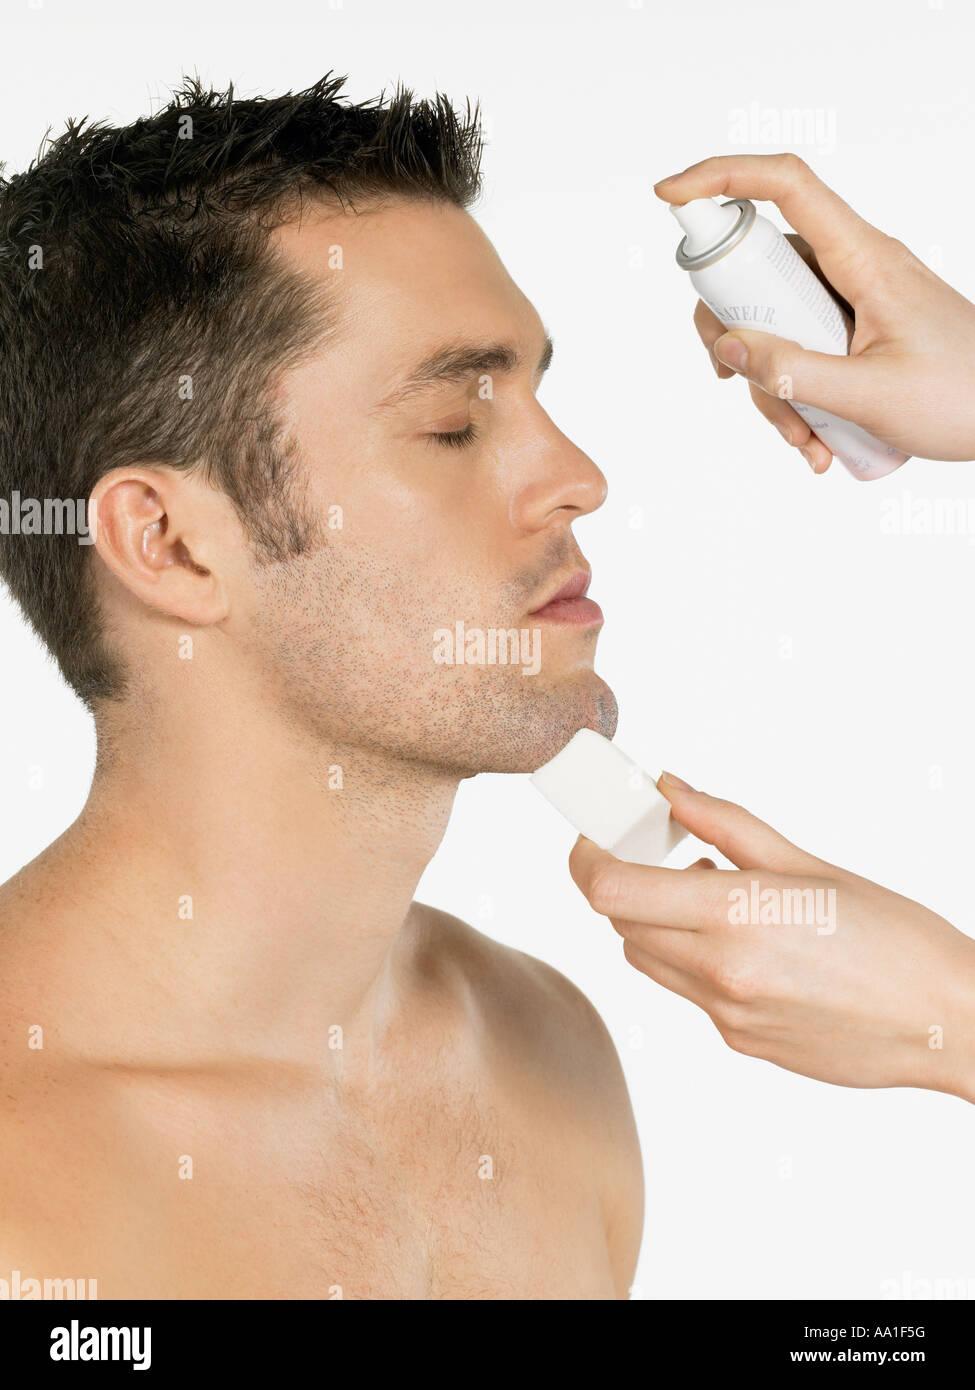 Man having water sprayed on his face Stock Photo